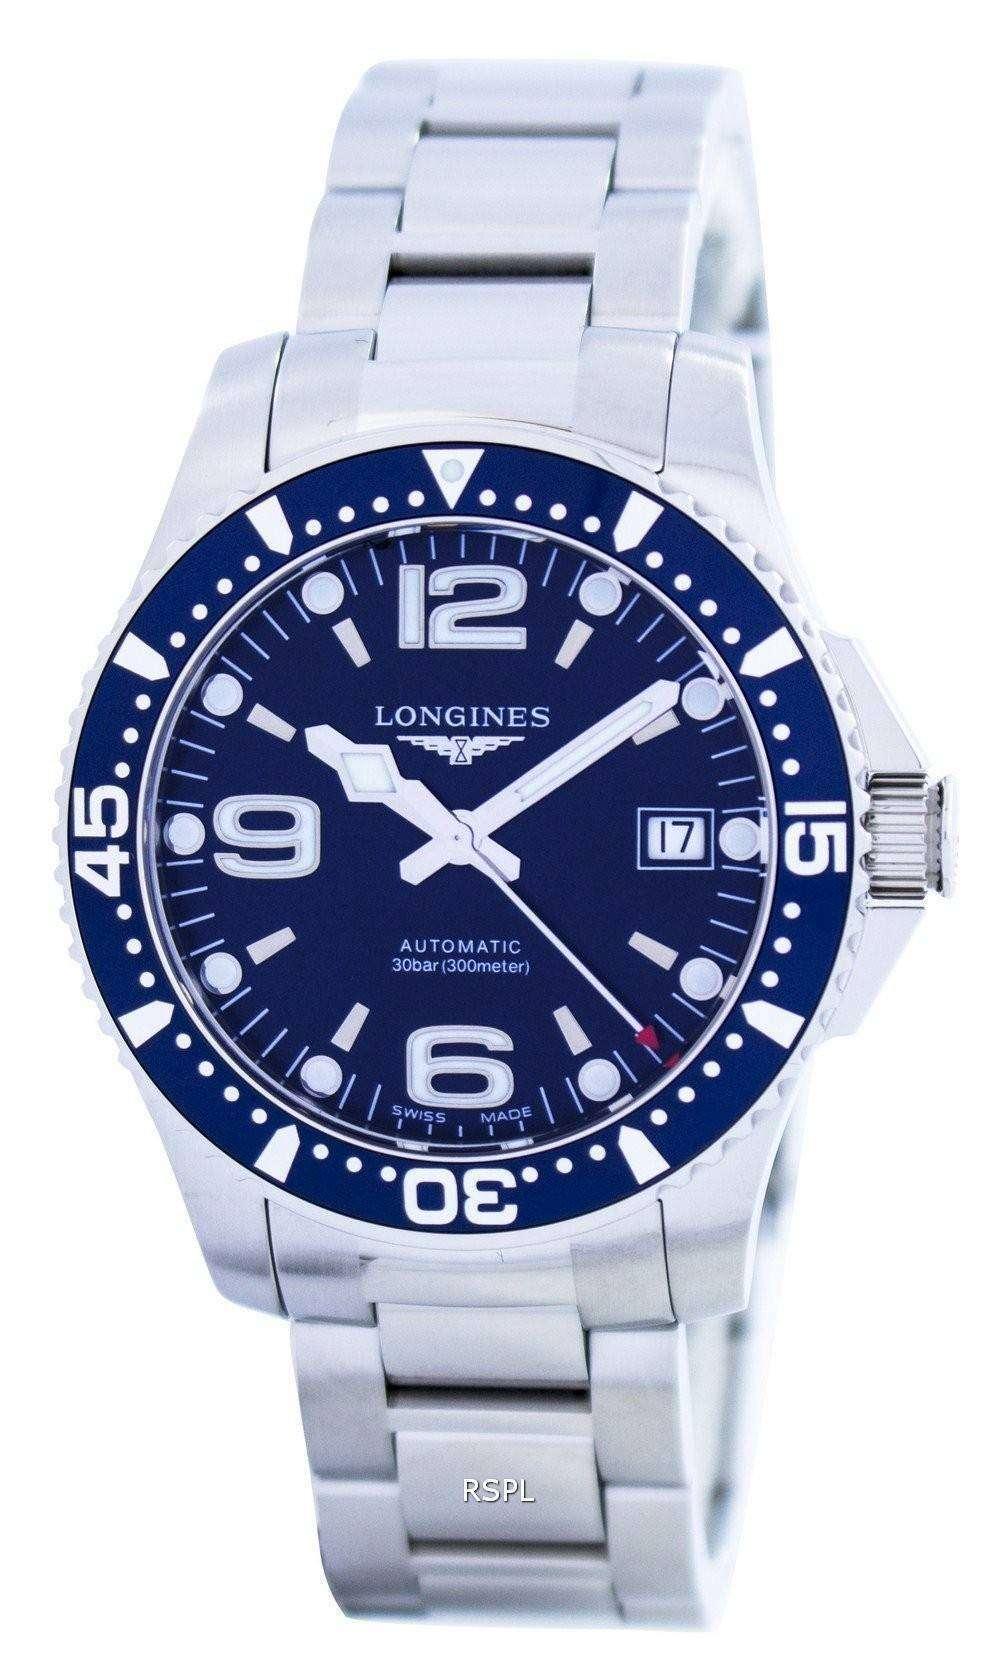 Longines Hydroconquest Automatic >> Longines Hydroconquest Automatic Power Reserve L3 641 4 96 6 Mens Watch